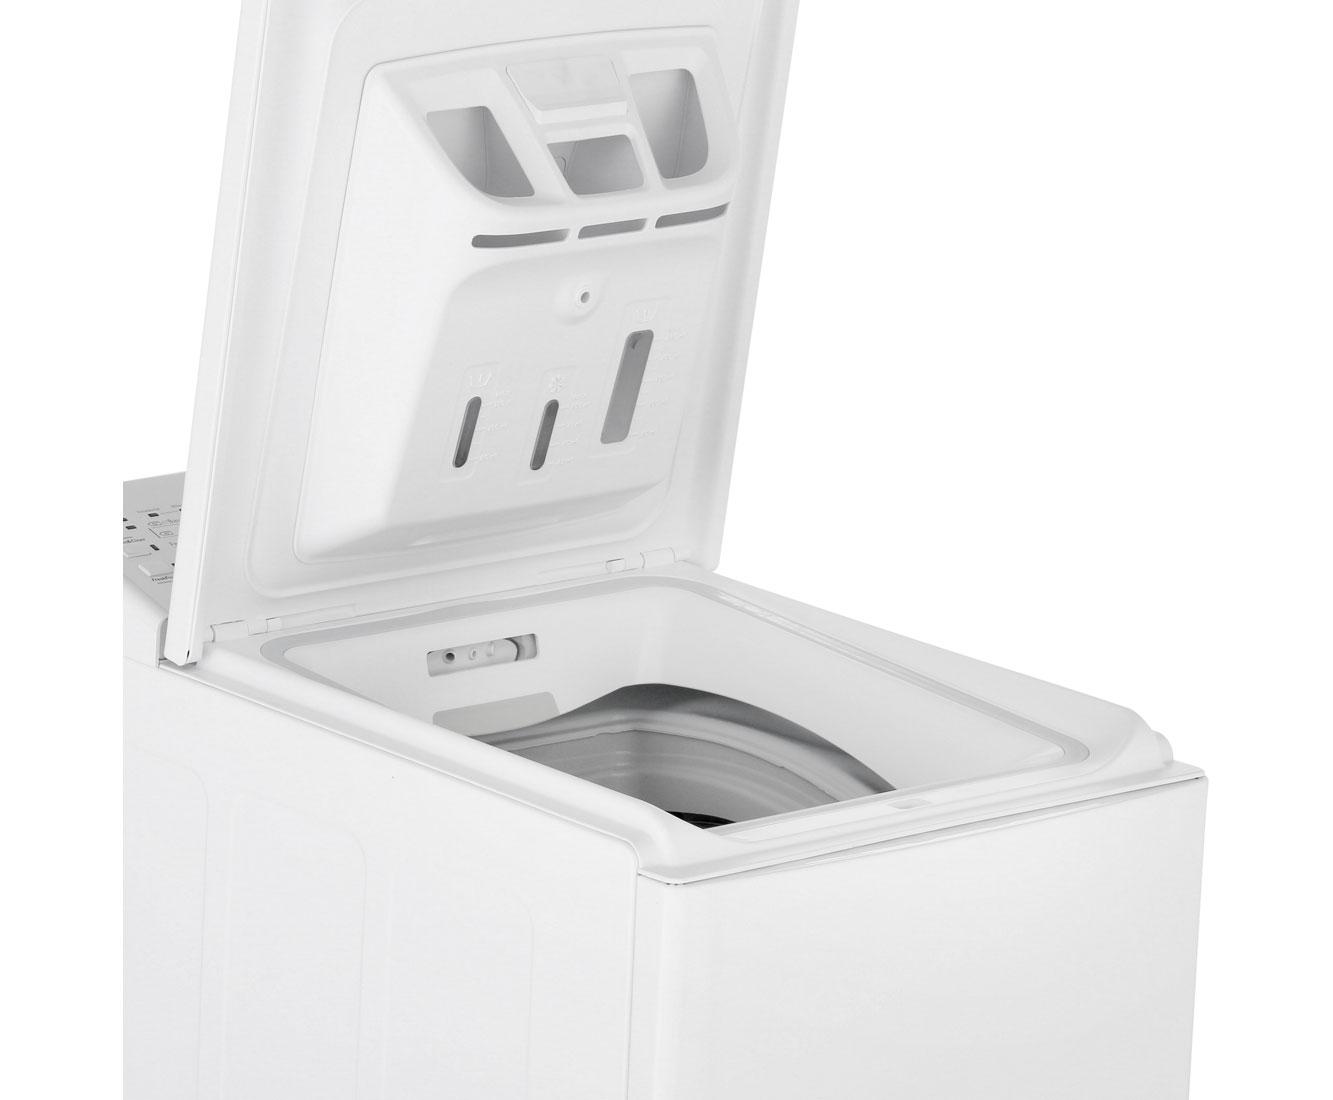 Bauknecht wmt ecostar di waschmaschine toplader kg u